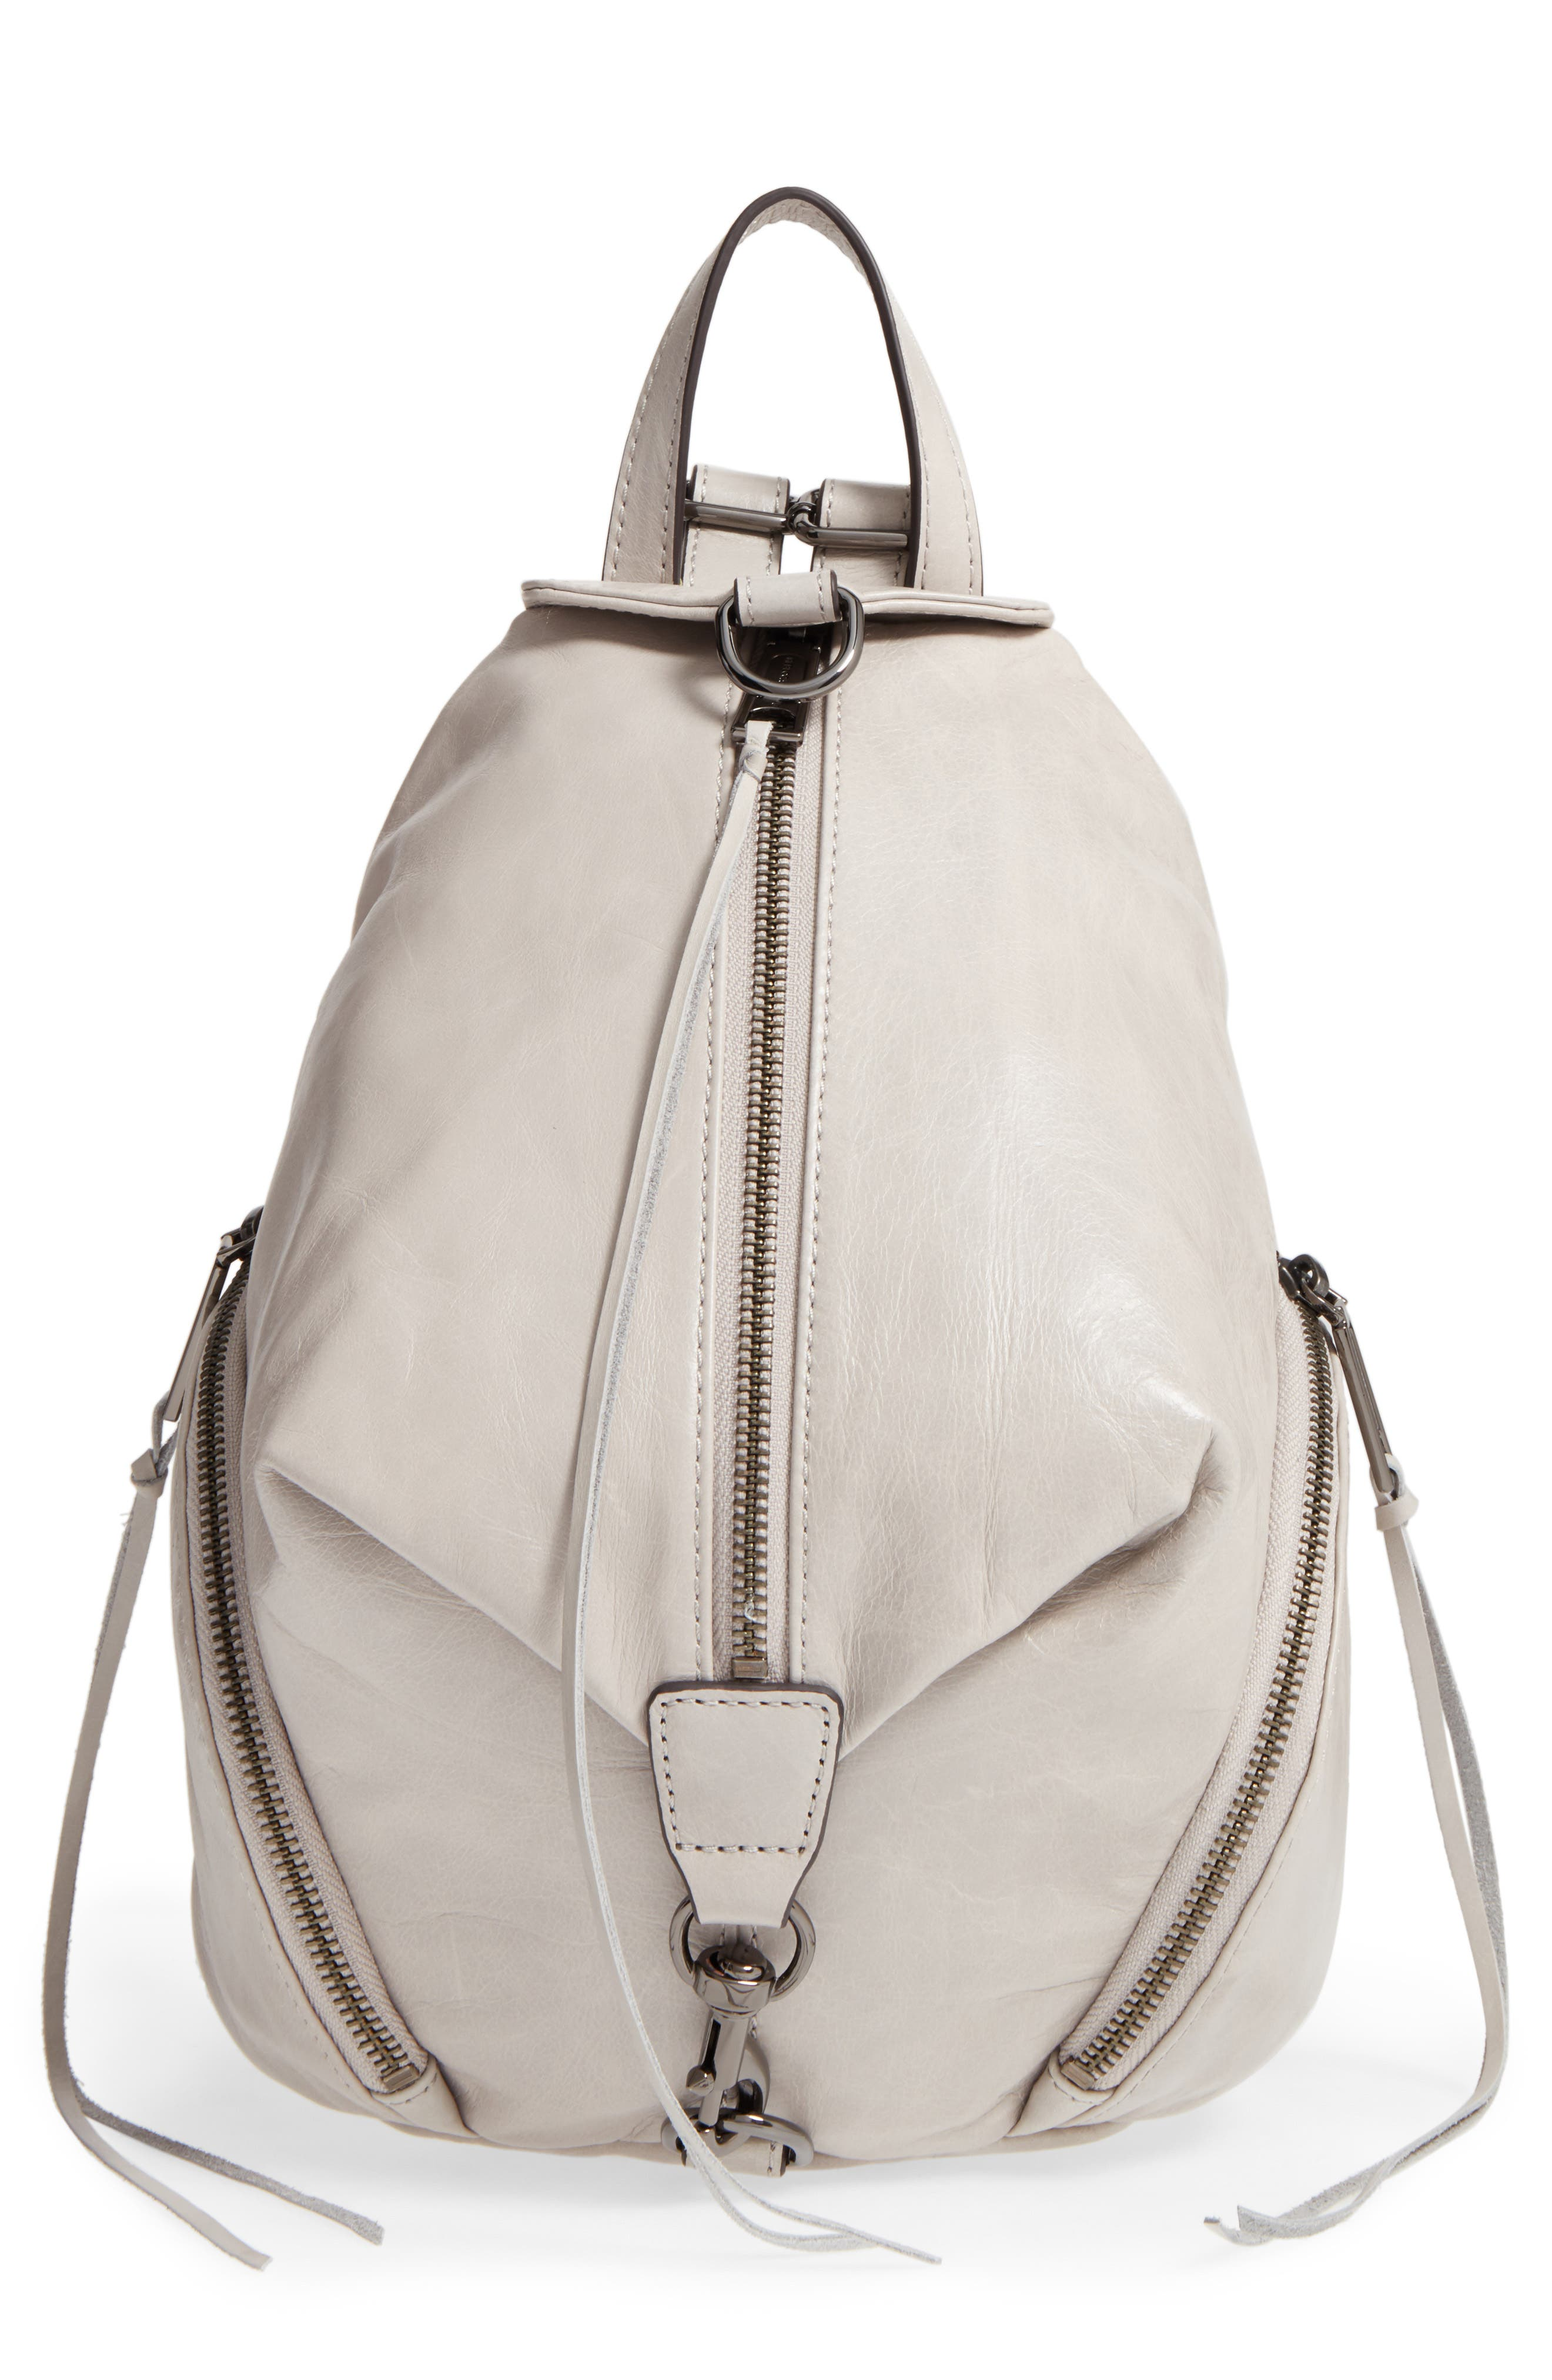 Medium Julian Leather Backpack,                             Main thumbnail 1, color,                             Putty/ Gunmetal